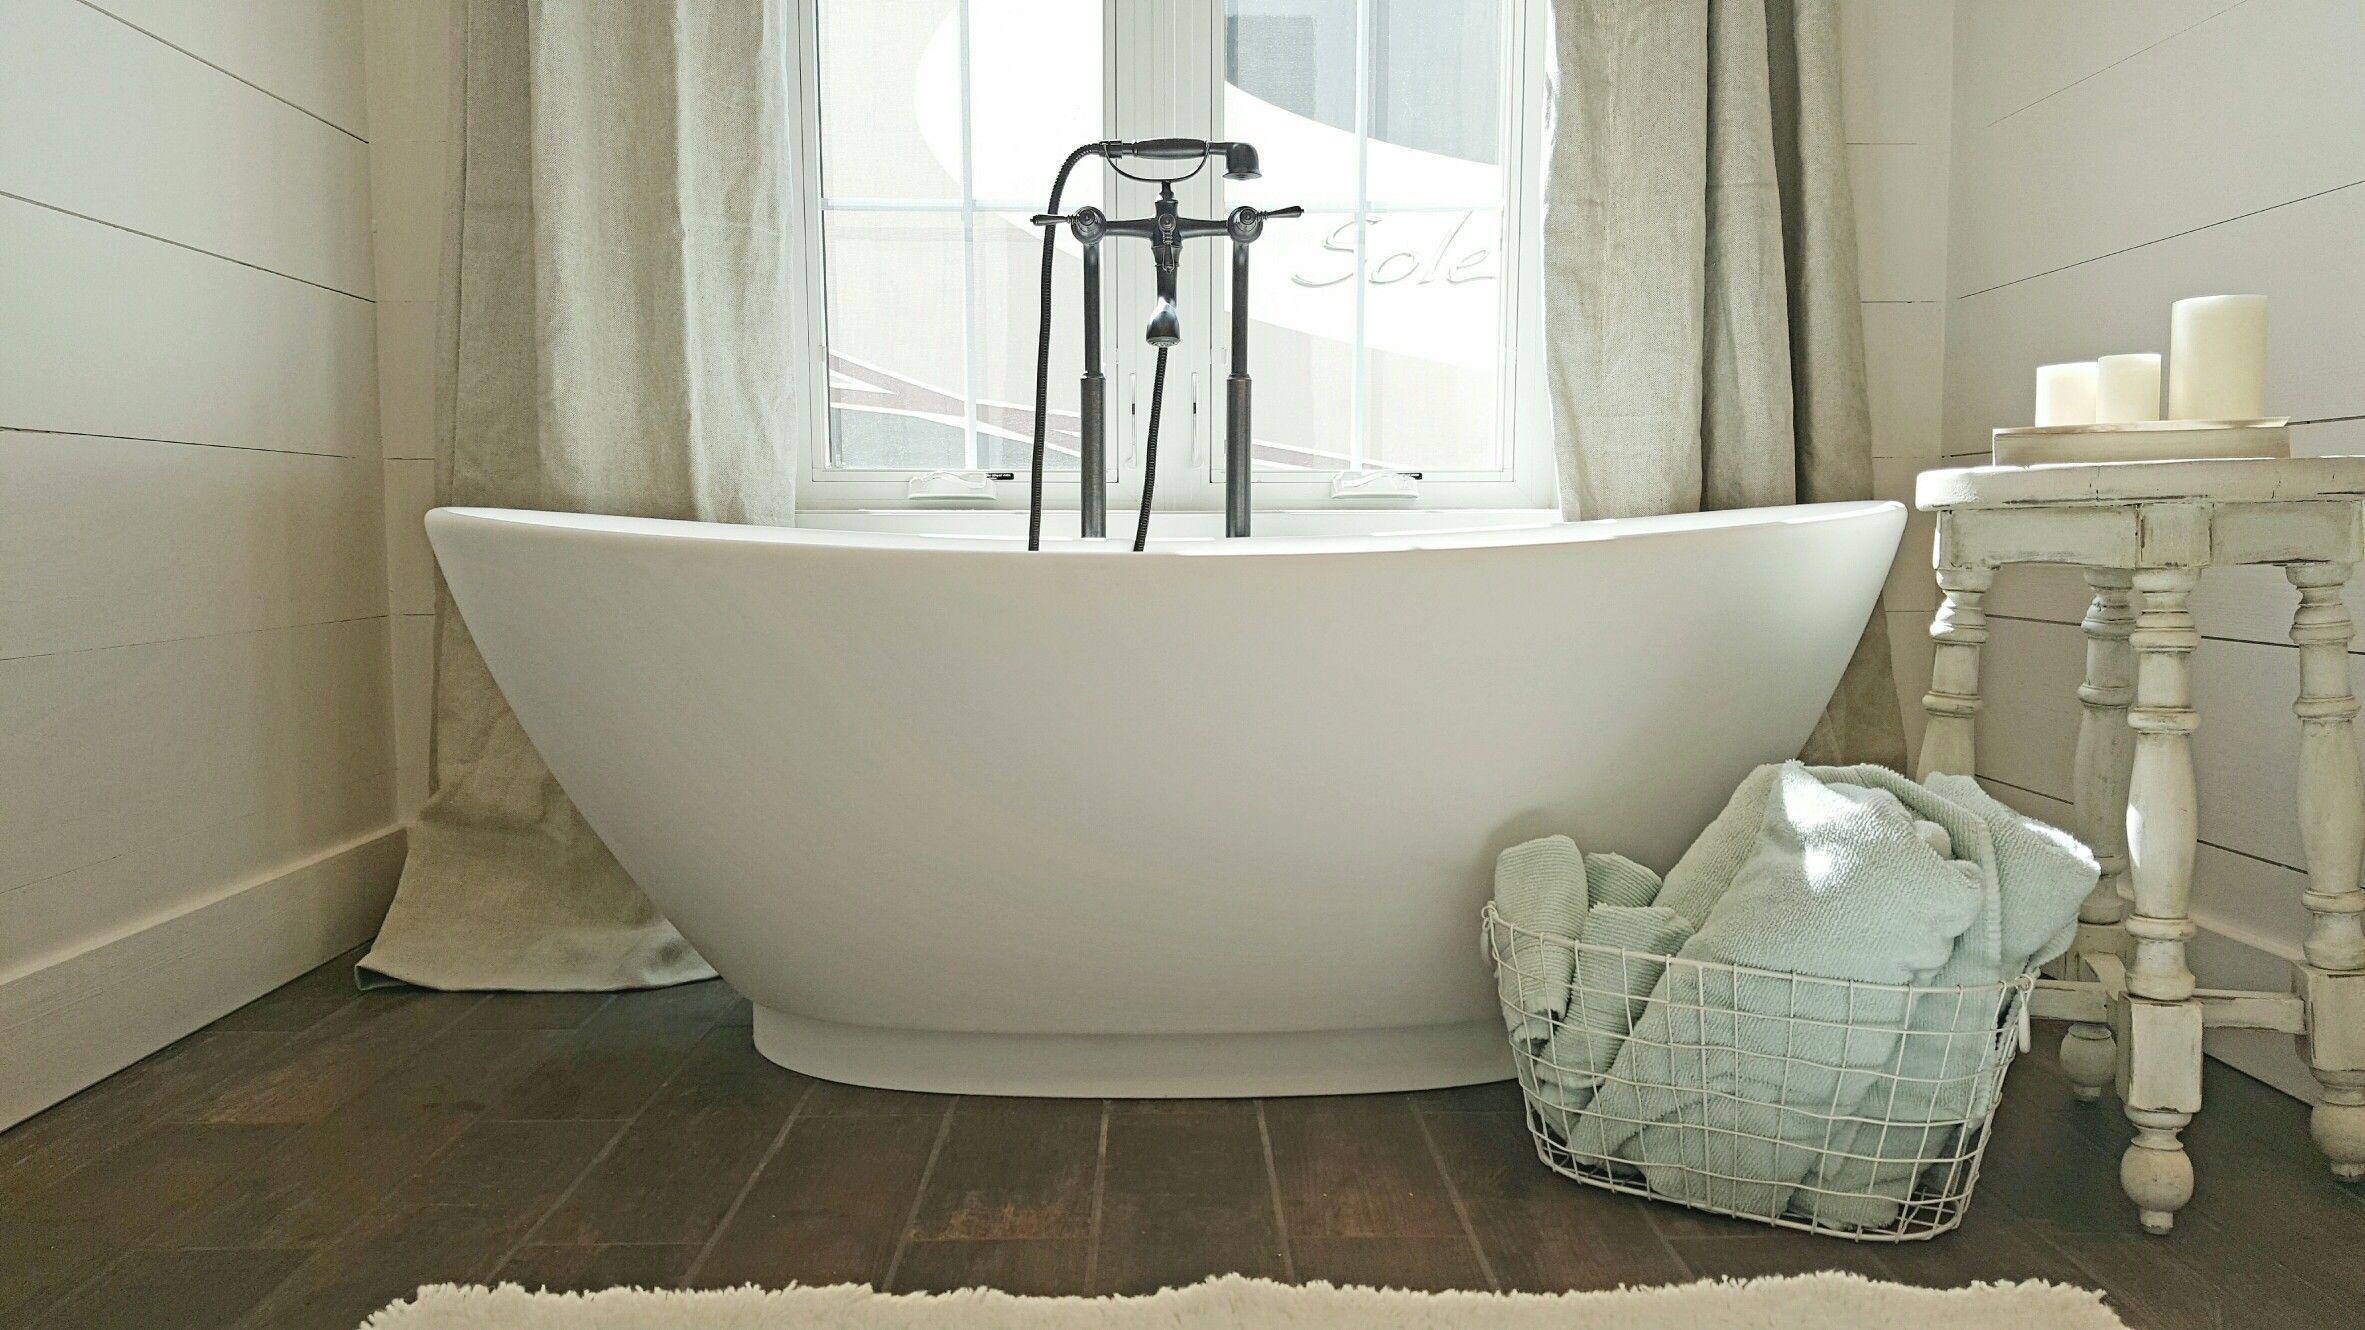 Unique Roman Bathtubs Motif - Bathtub Design Ideas - valtak.com